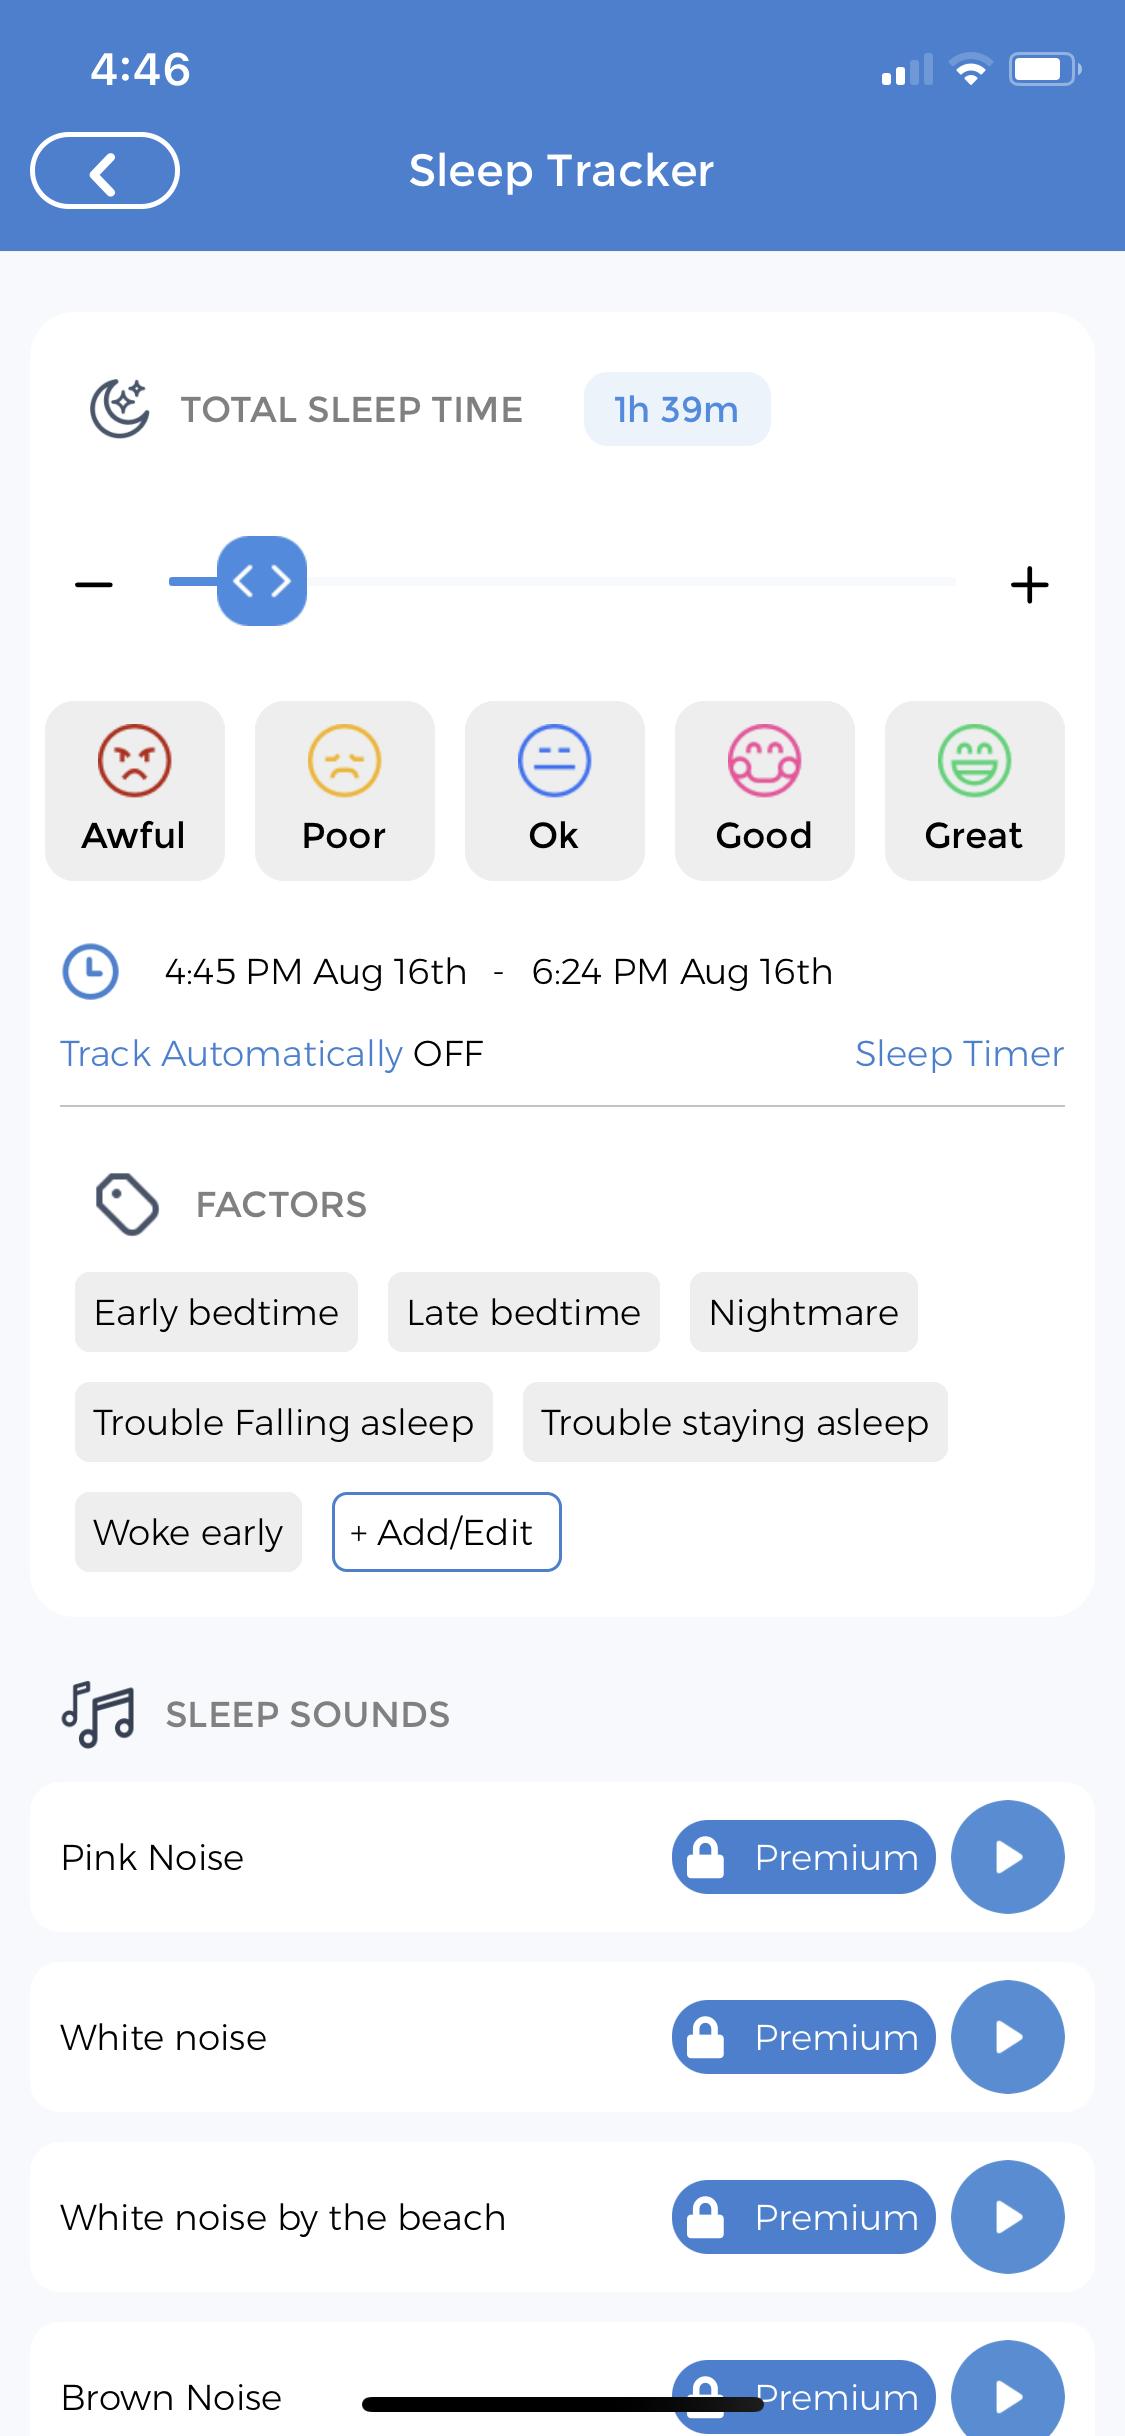 Sleep Tracker for Babies